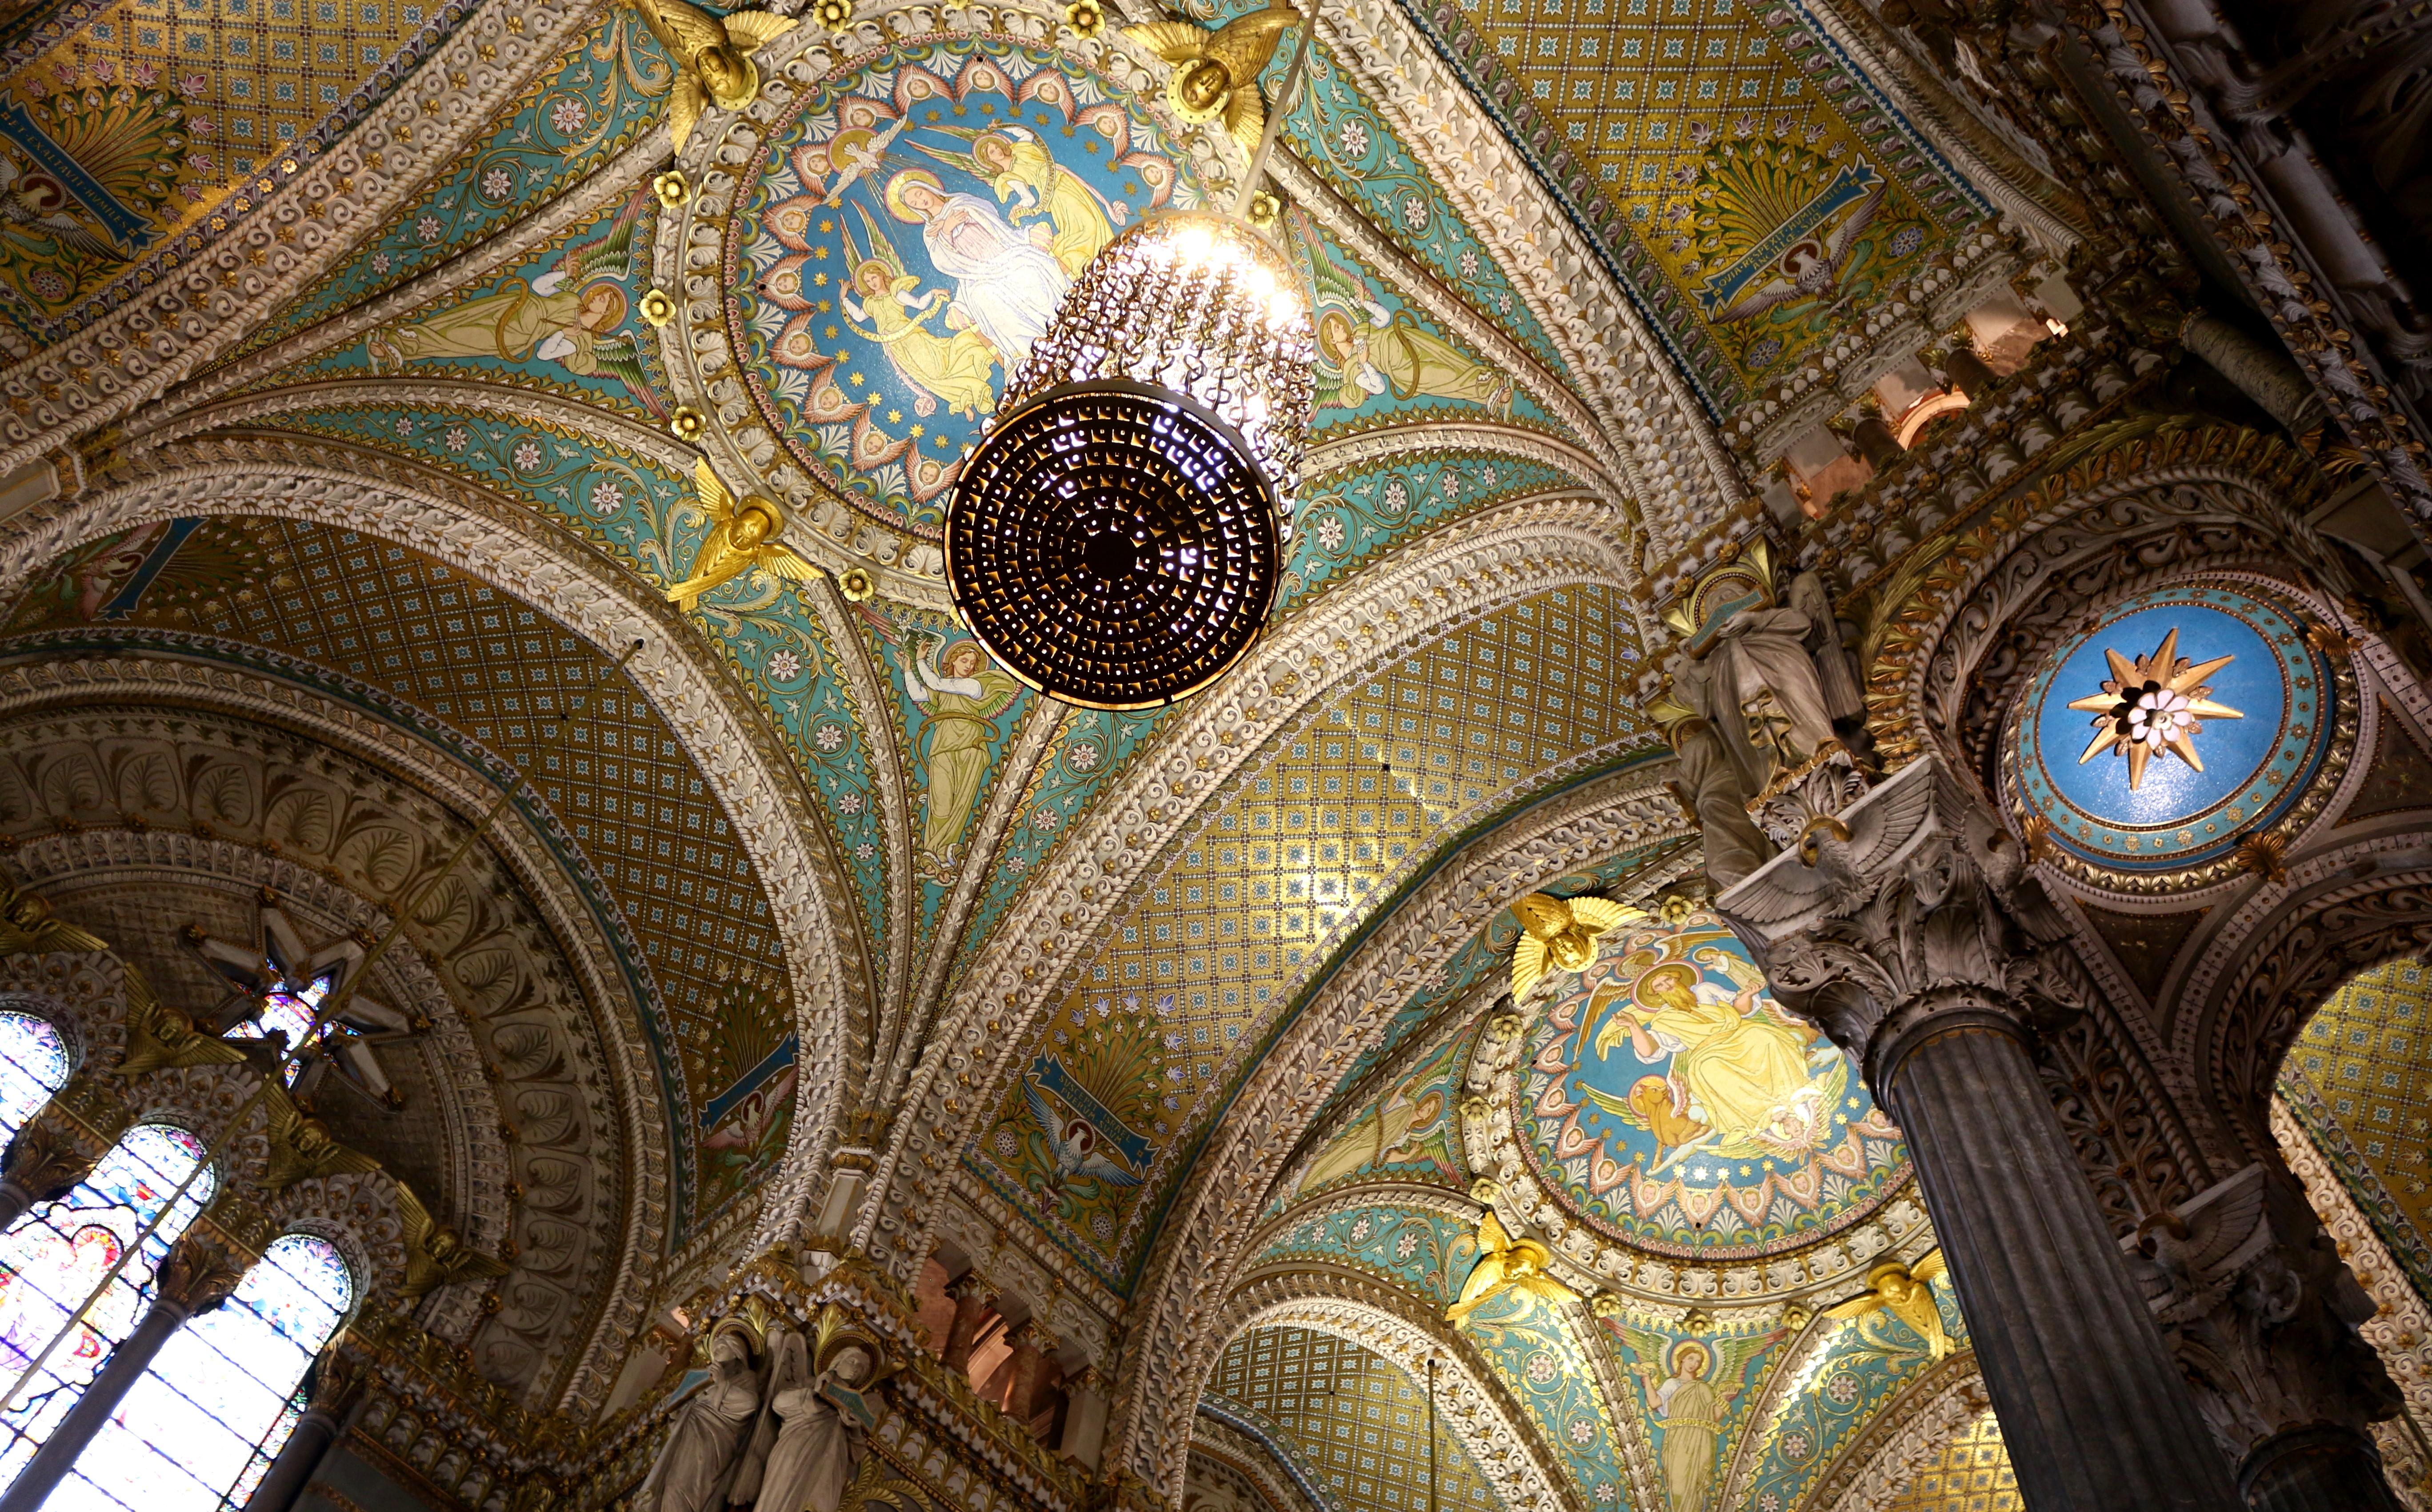 Die imposante Kathedrale von Lyon